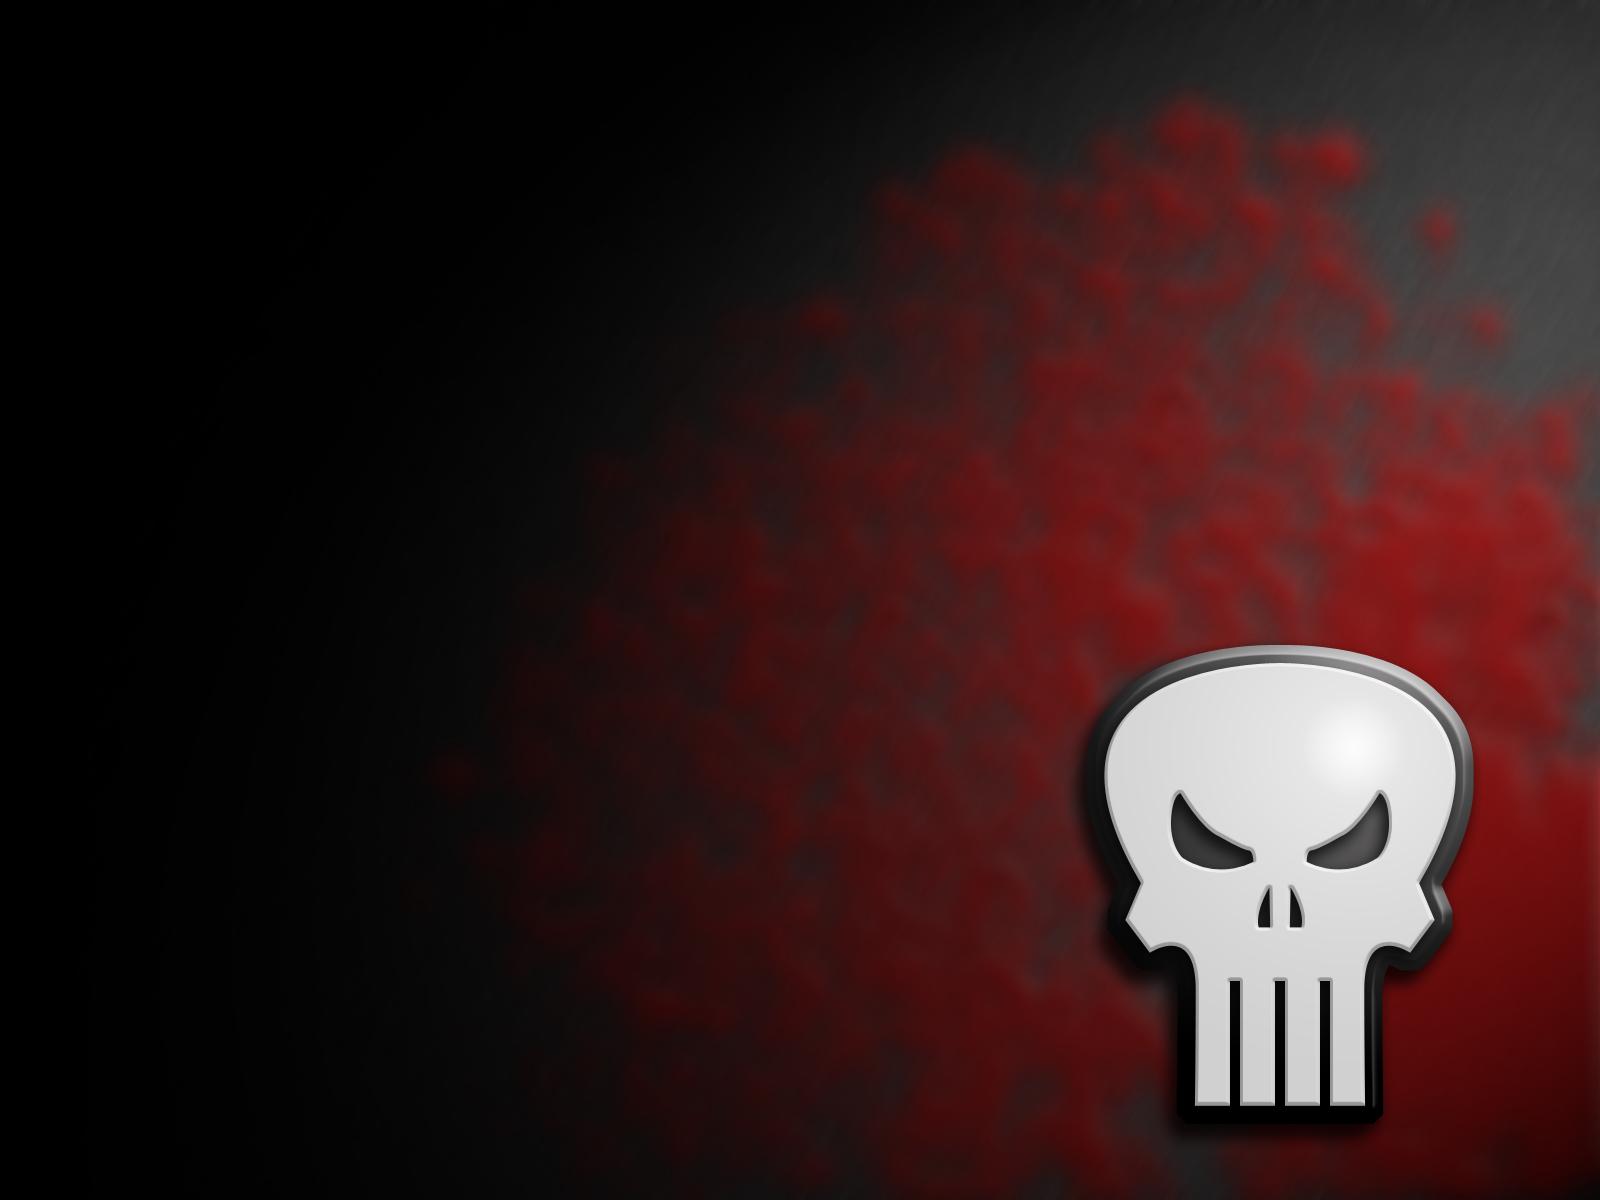 Punisher Symbol   Comics Photography Desktop Wallpapers 2914 Views 1600x1200